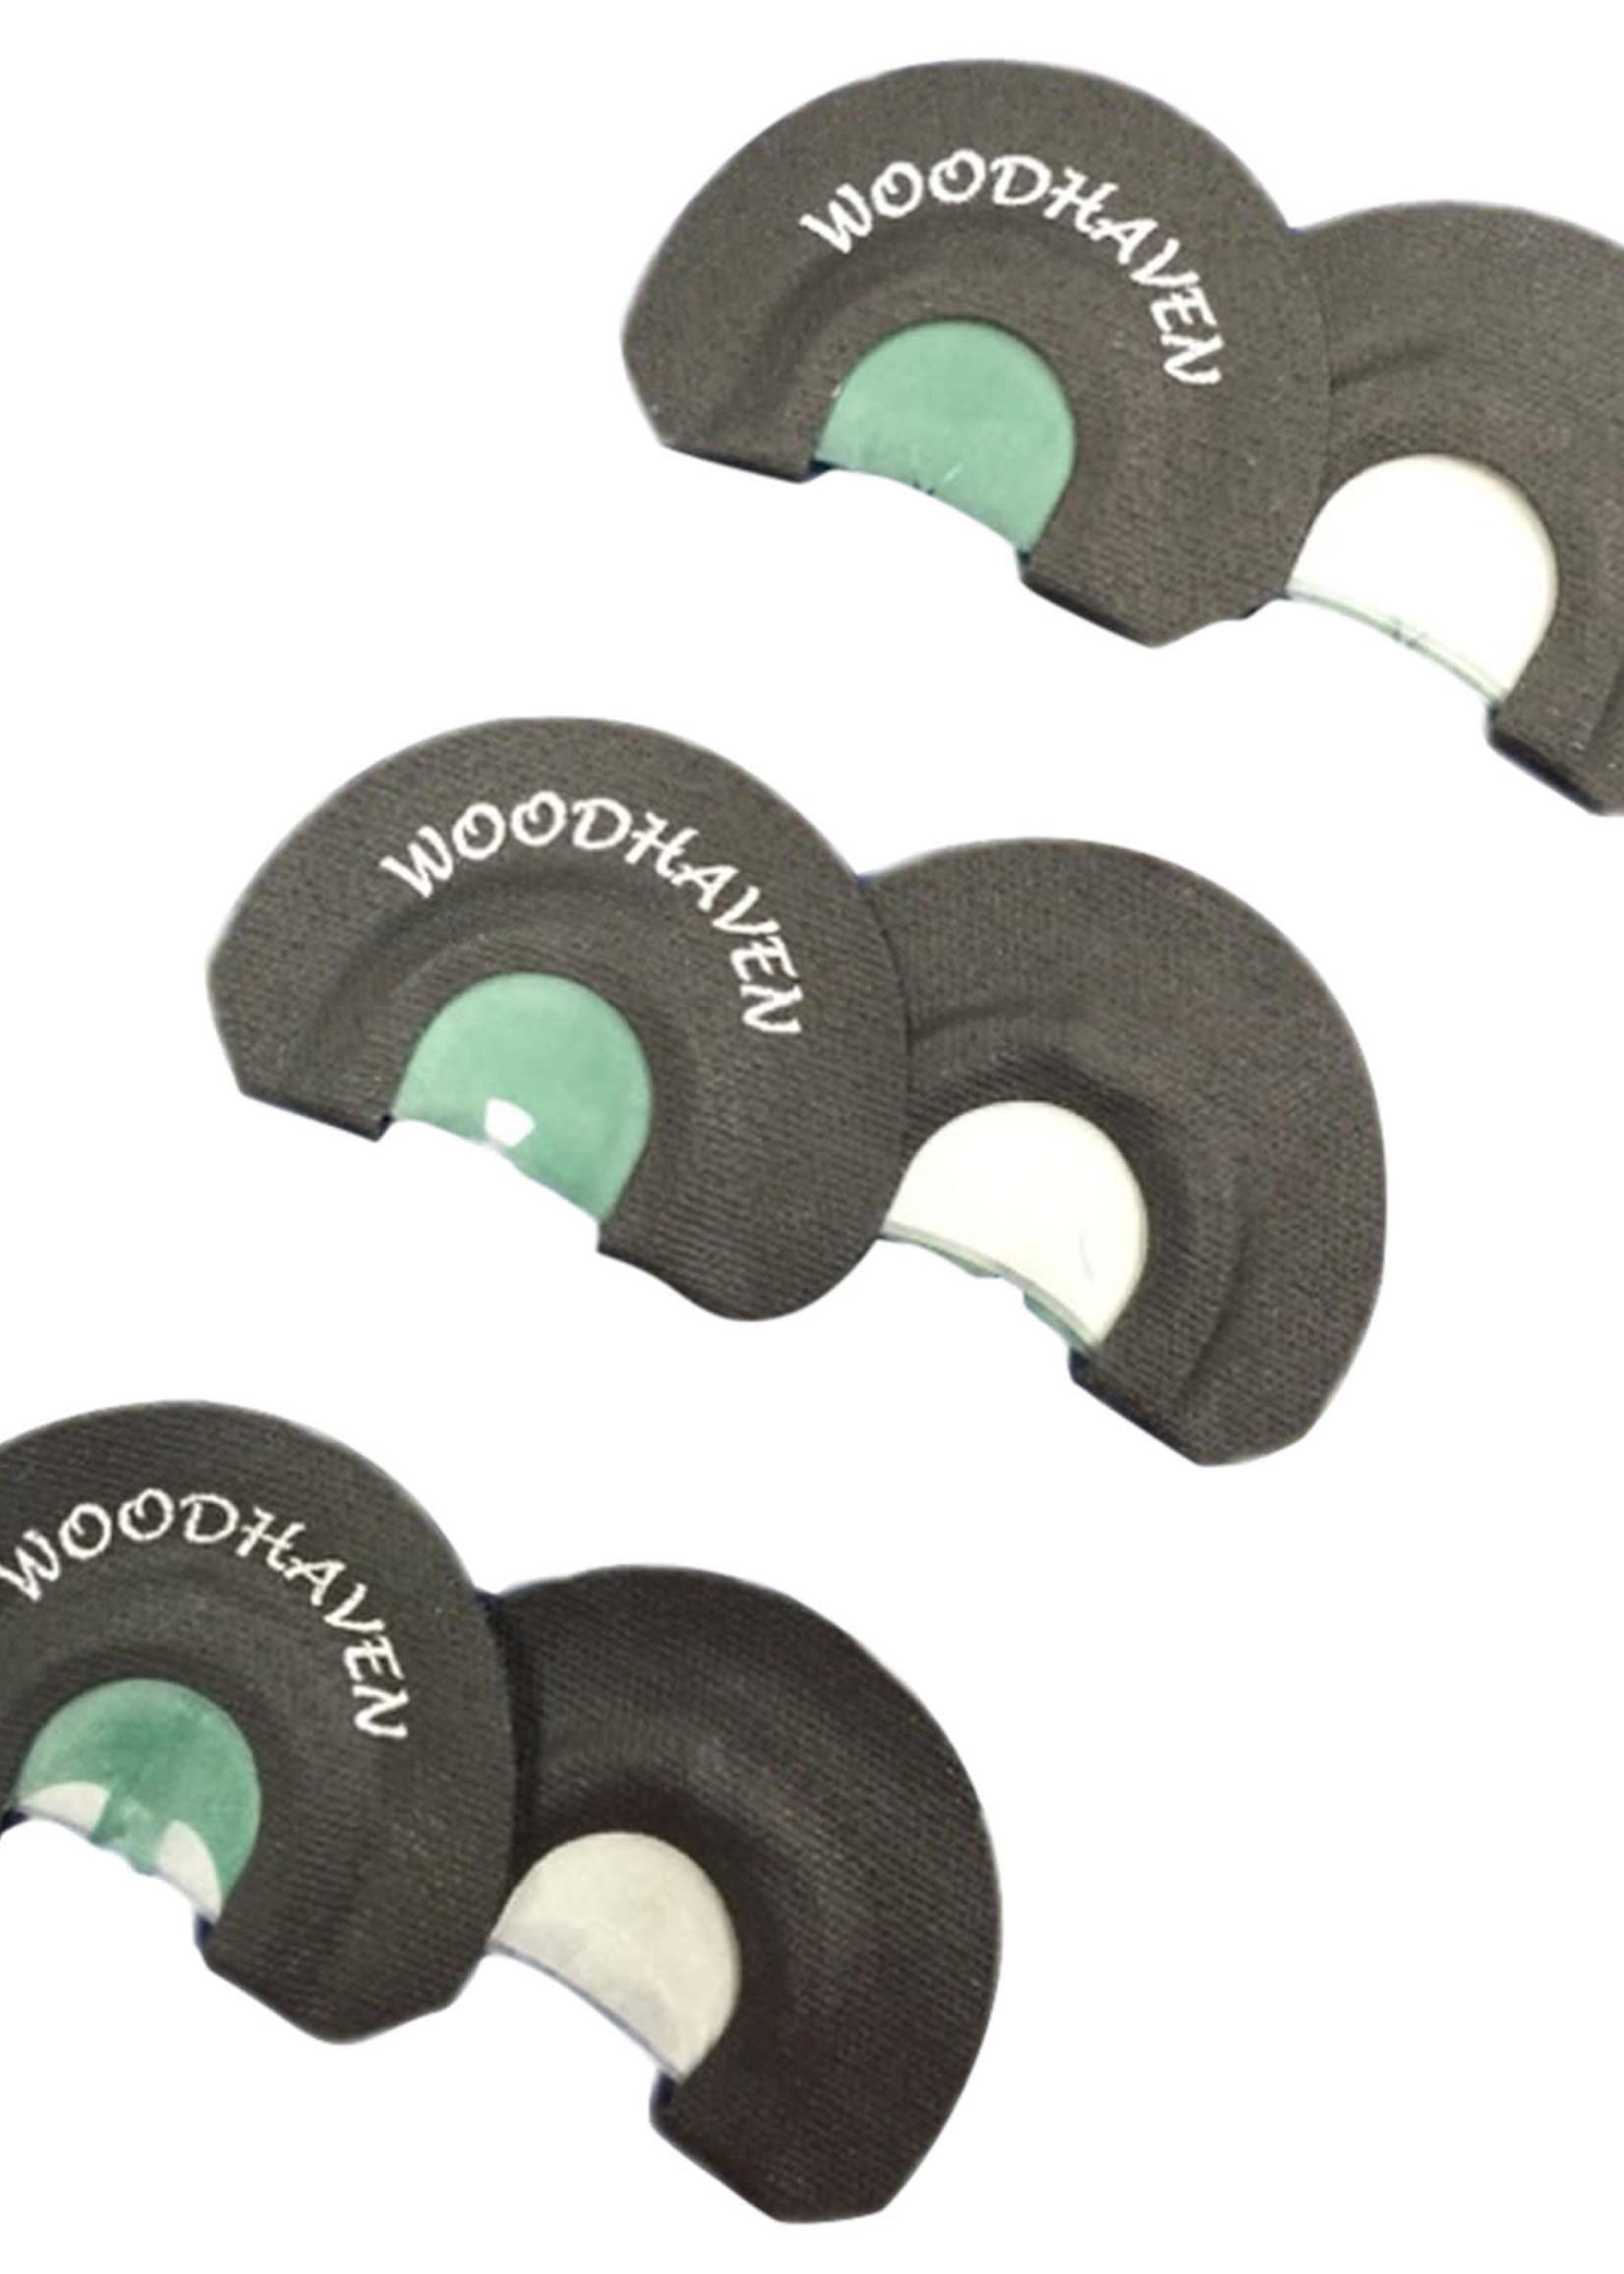 Woodhaven Custom Calls Woodhaven Ninja 3pk